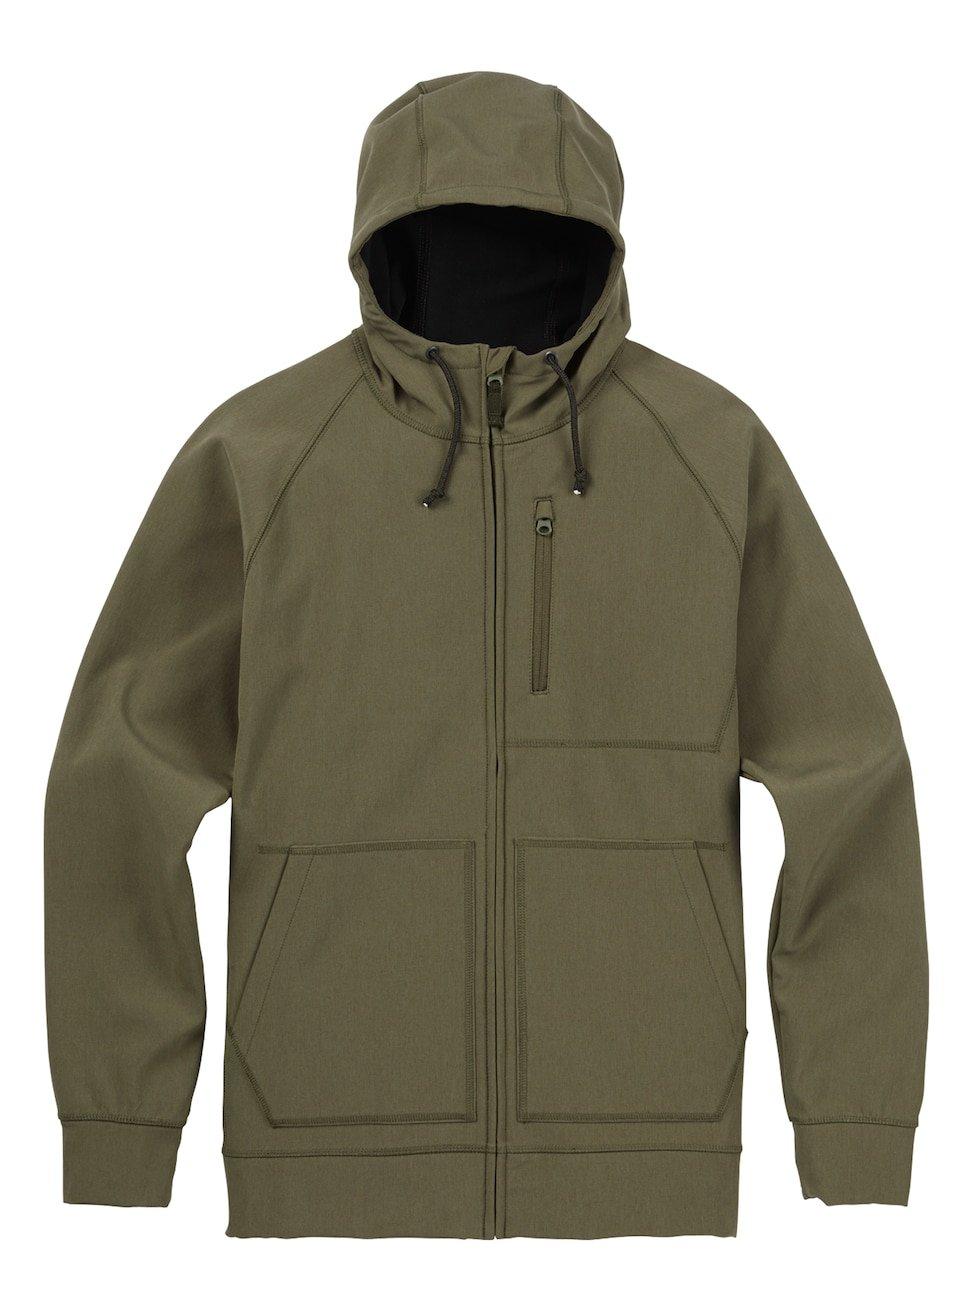 Burton Men's Bonded Full-Zip Hoodie, Dusty Olive Heather, XX-Large